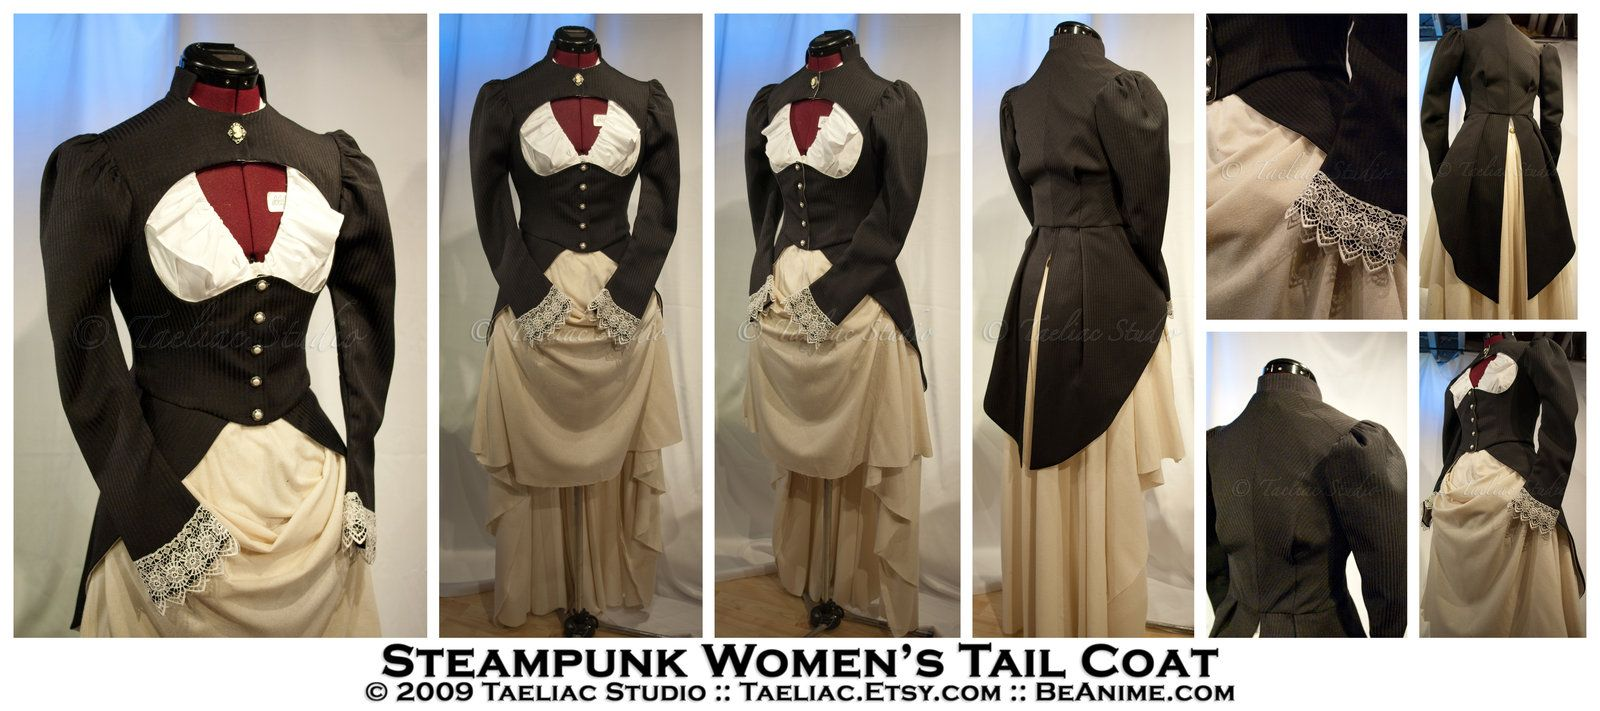 Steampunk womens tail coat by taeliaciantart on steampunk womens tail coat by taeliaciantart on deviantart jeuxipadfo Images